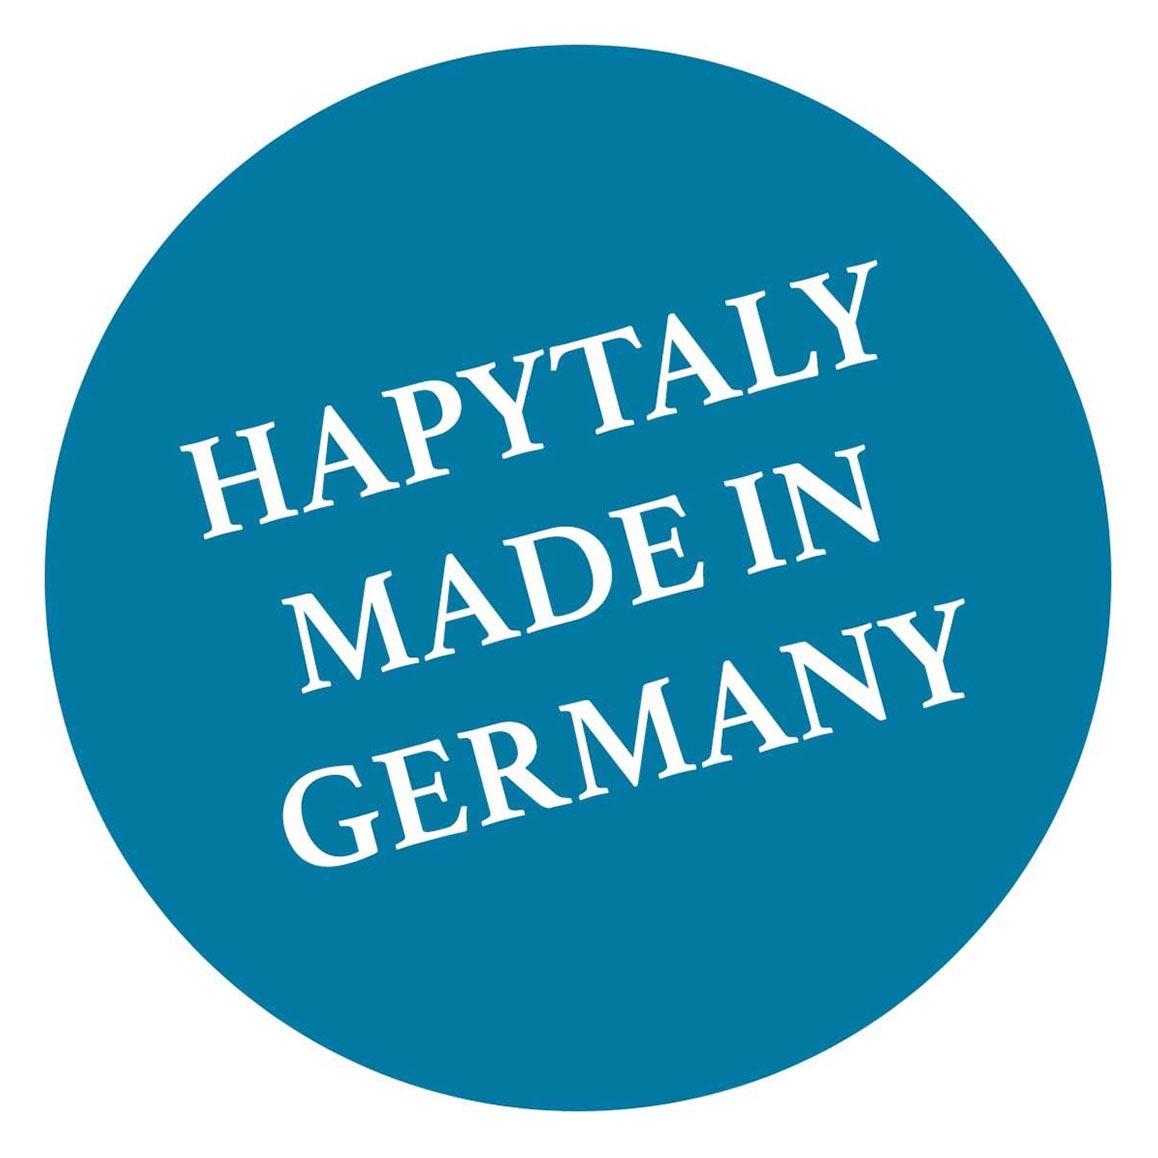 Hapytaly – Made in Germany